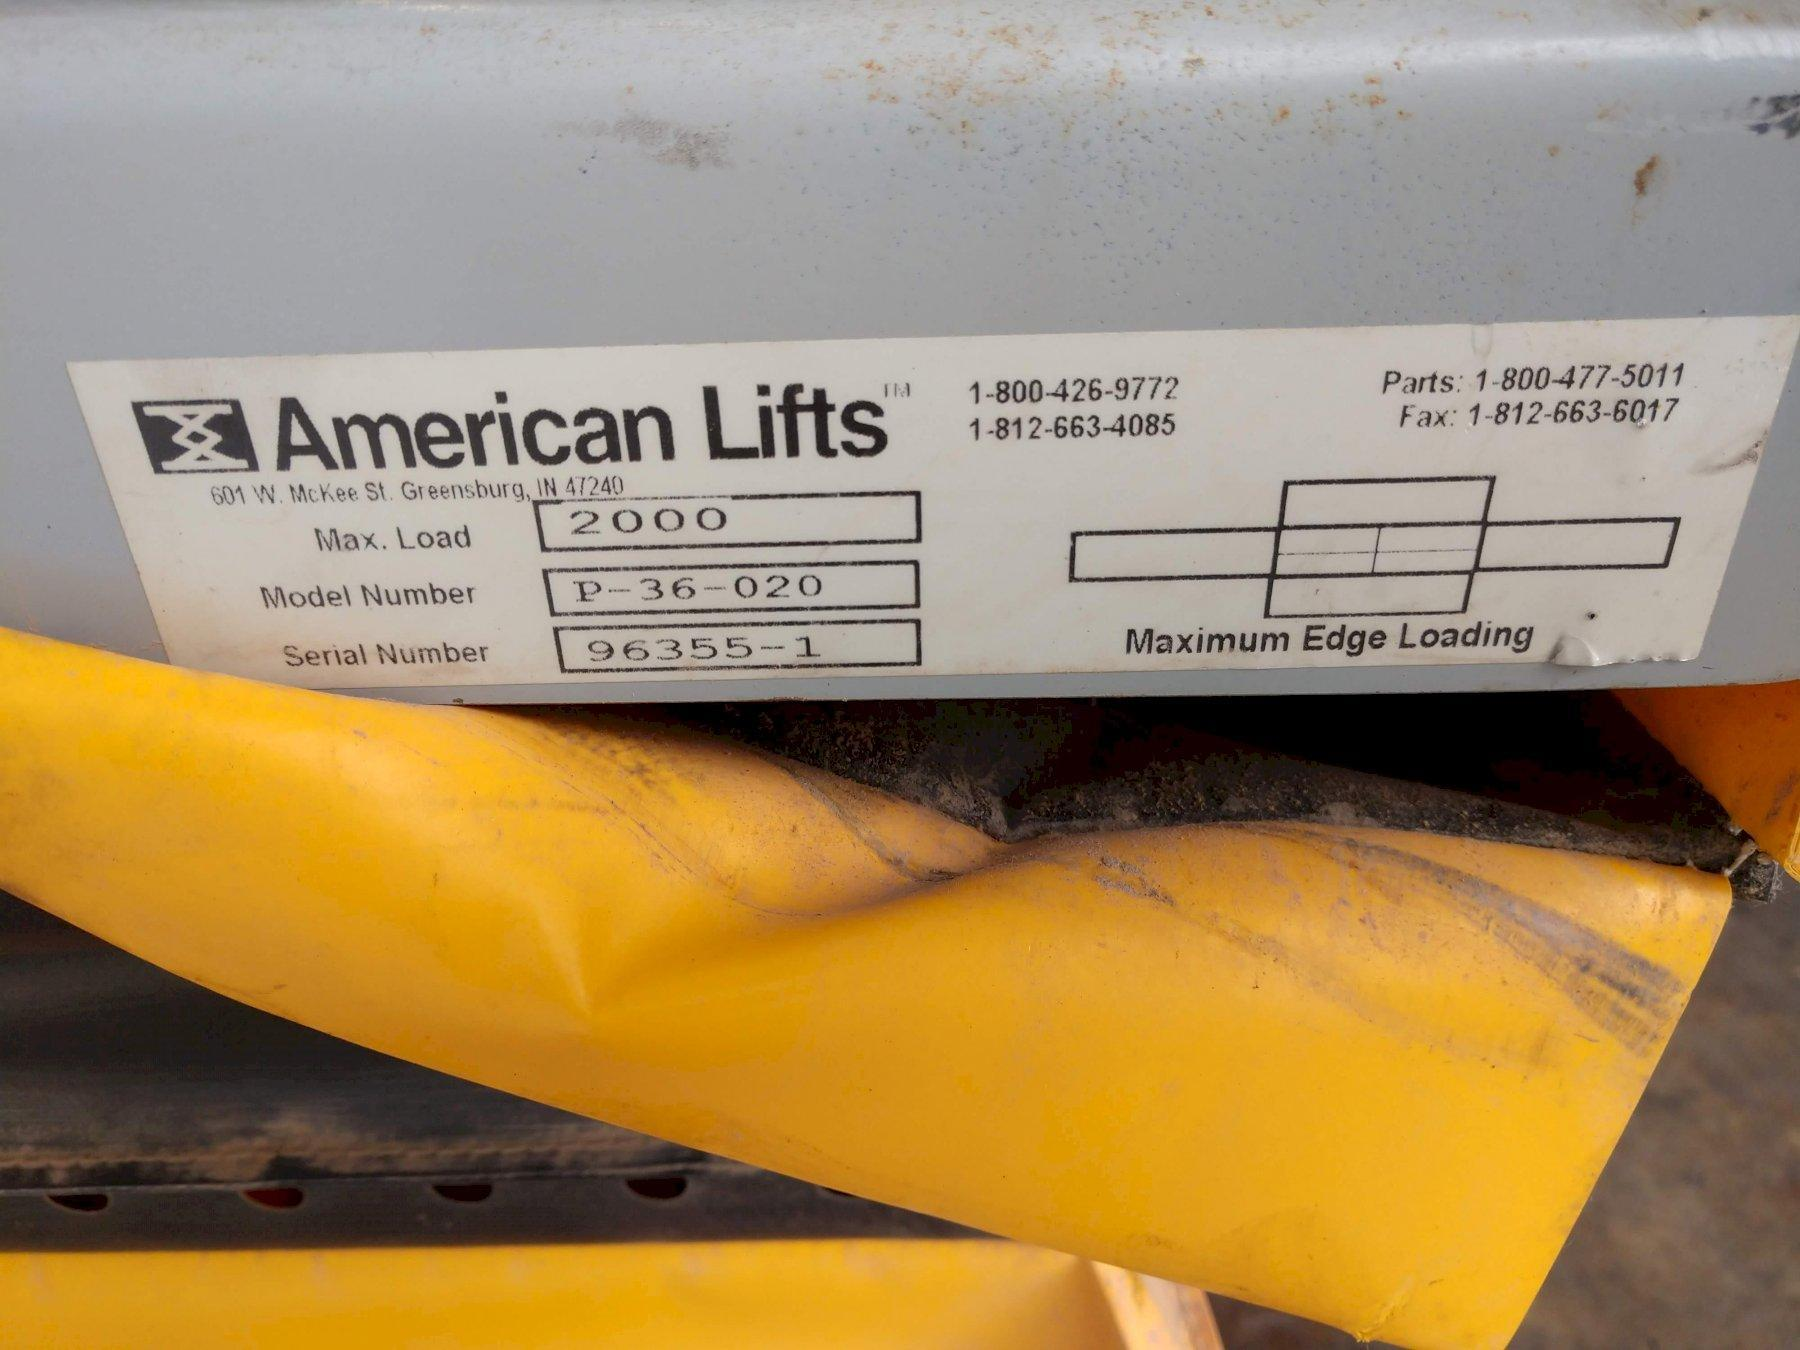 "2,000 LBS X 24"" X 48"" AMERICAN LIFTS MODEL #P-36-020 SINGLE PHASE HYDRAULIC SCISSOR LIFT TABLE:"